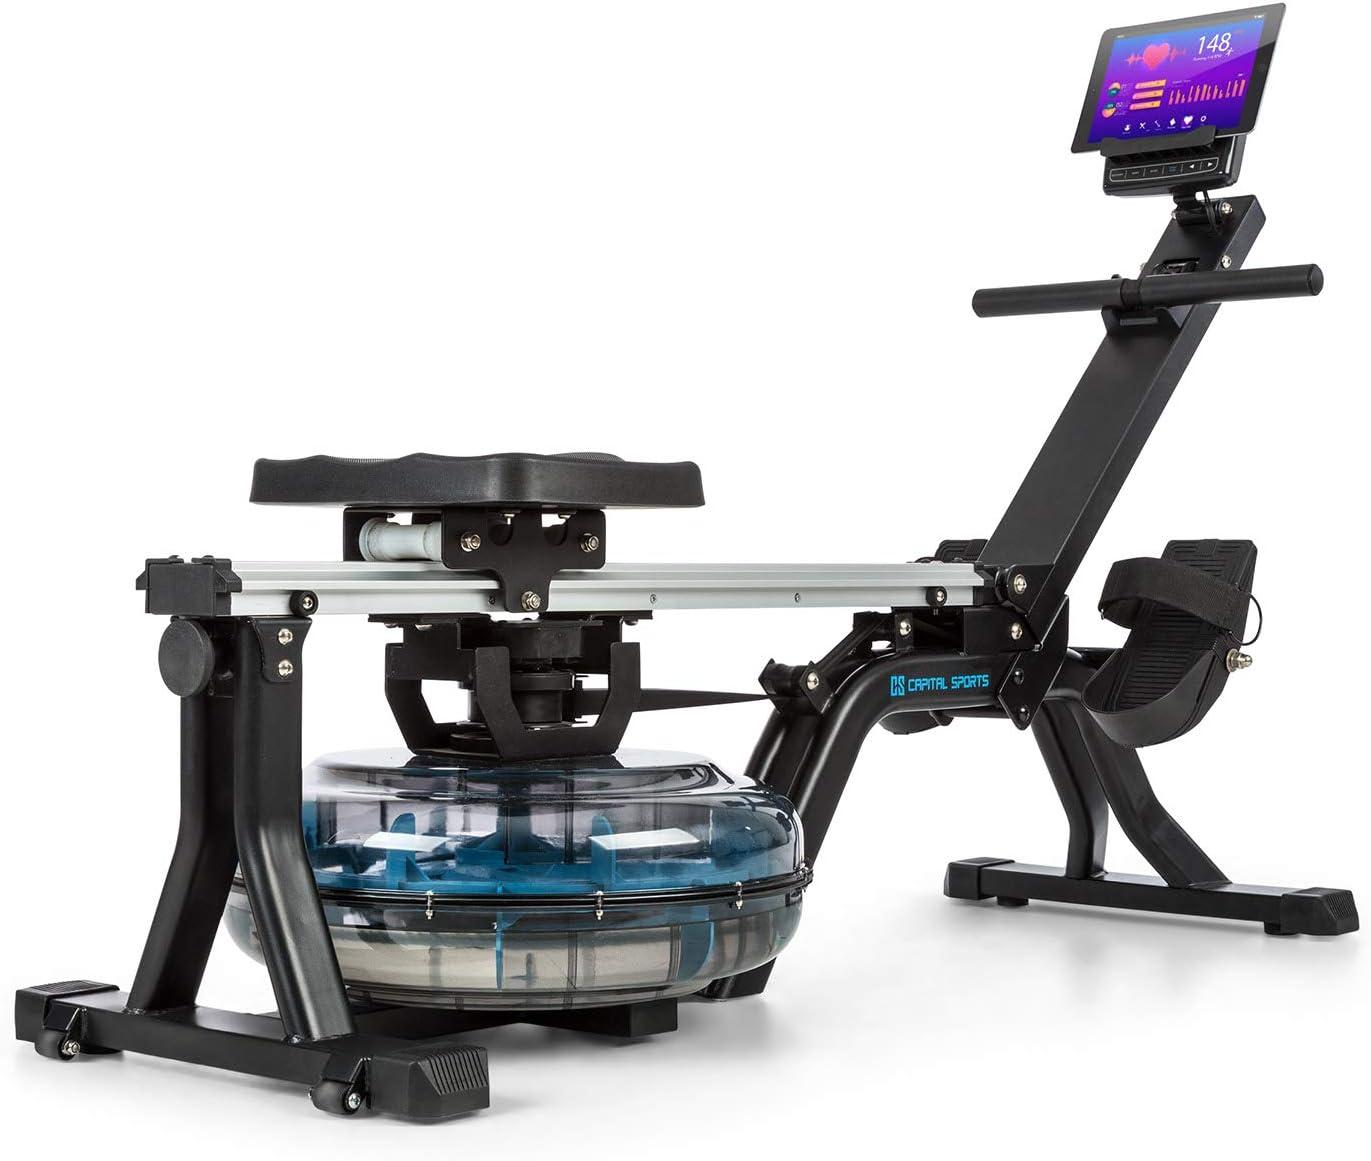 CapitalSports Flow M1 M2 Máquina de Remode Agua- Banco de Remo, 80 cm de Largo, 8Niveles/máx. 13/14 litros, Ordenador con Pantalla LCD, Soporte para tabletas, Aluminio